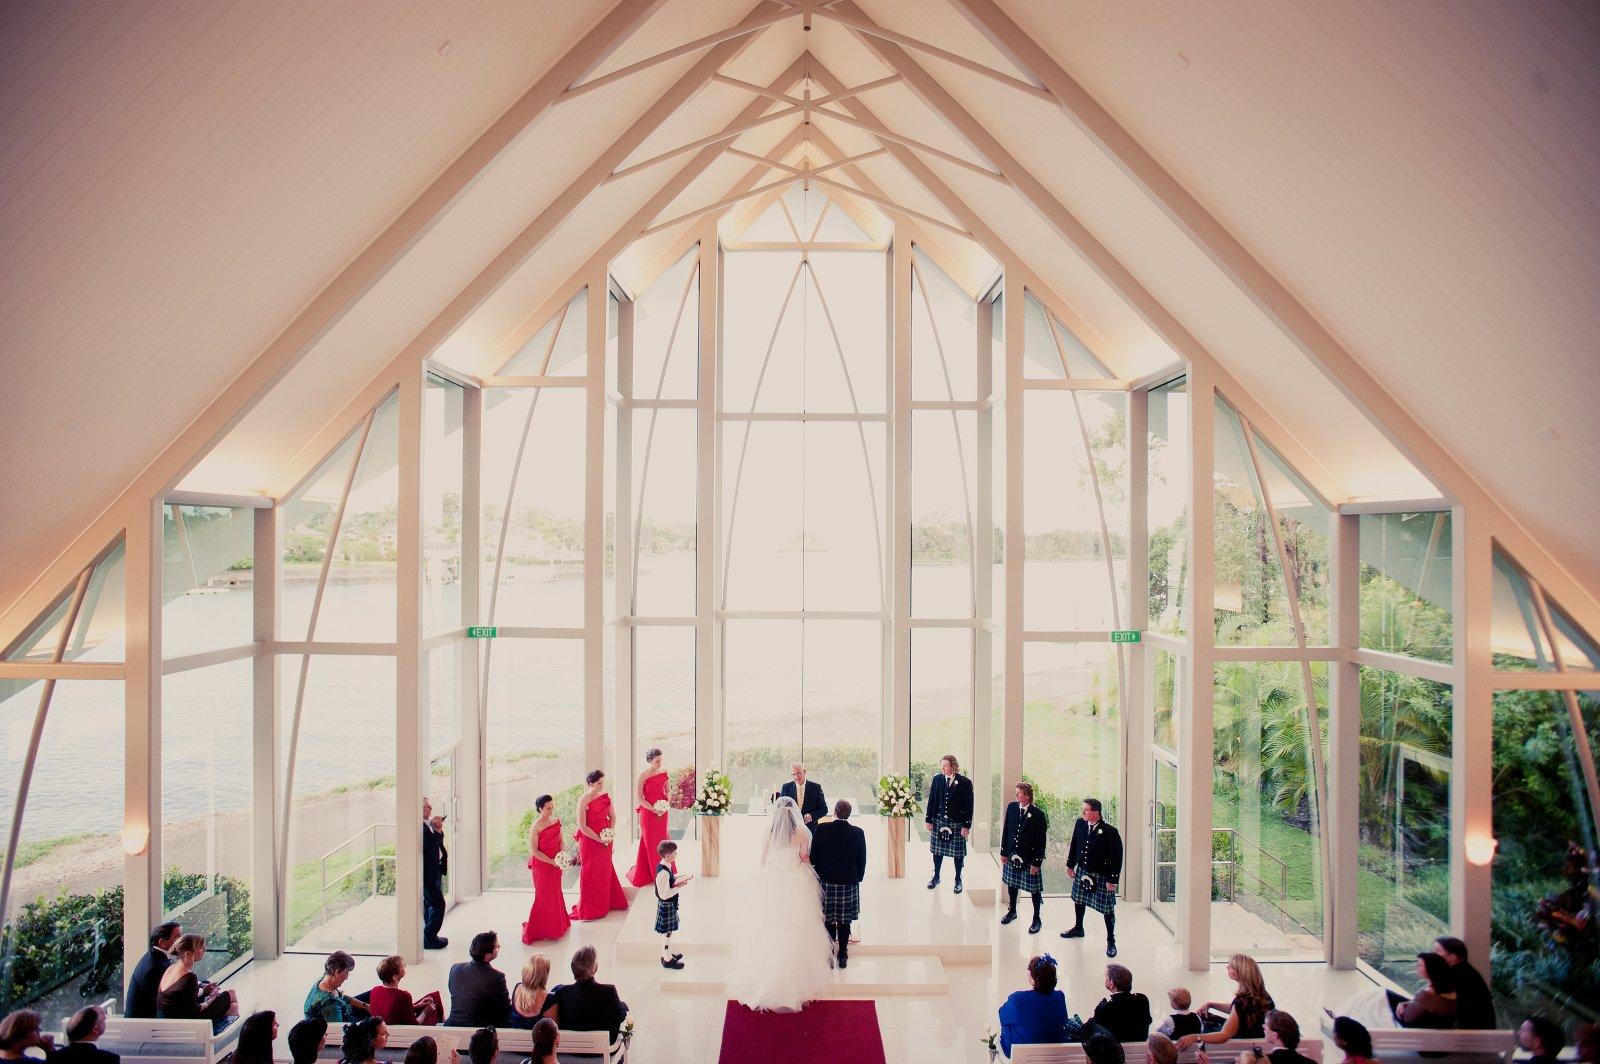 Sanctuary-cove-wedding-chapel